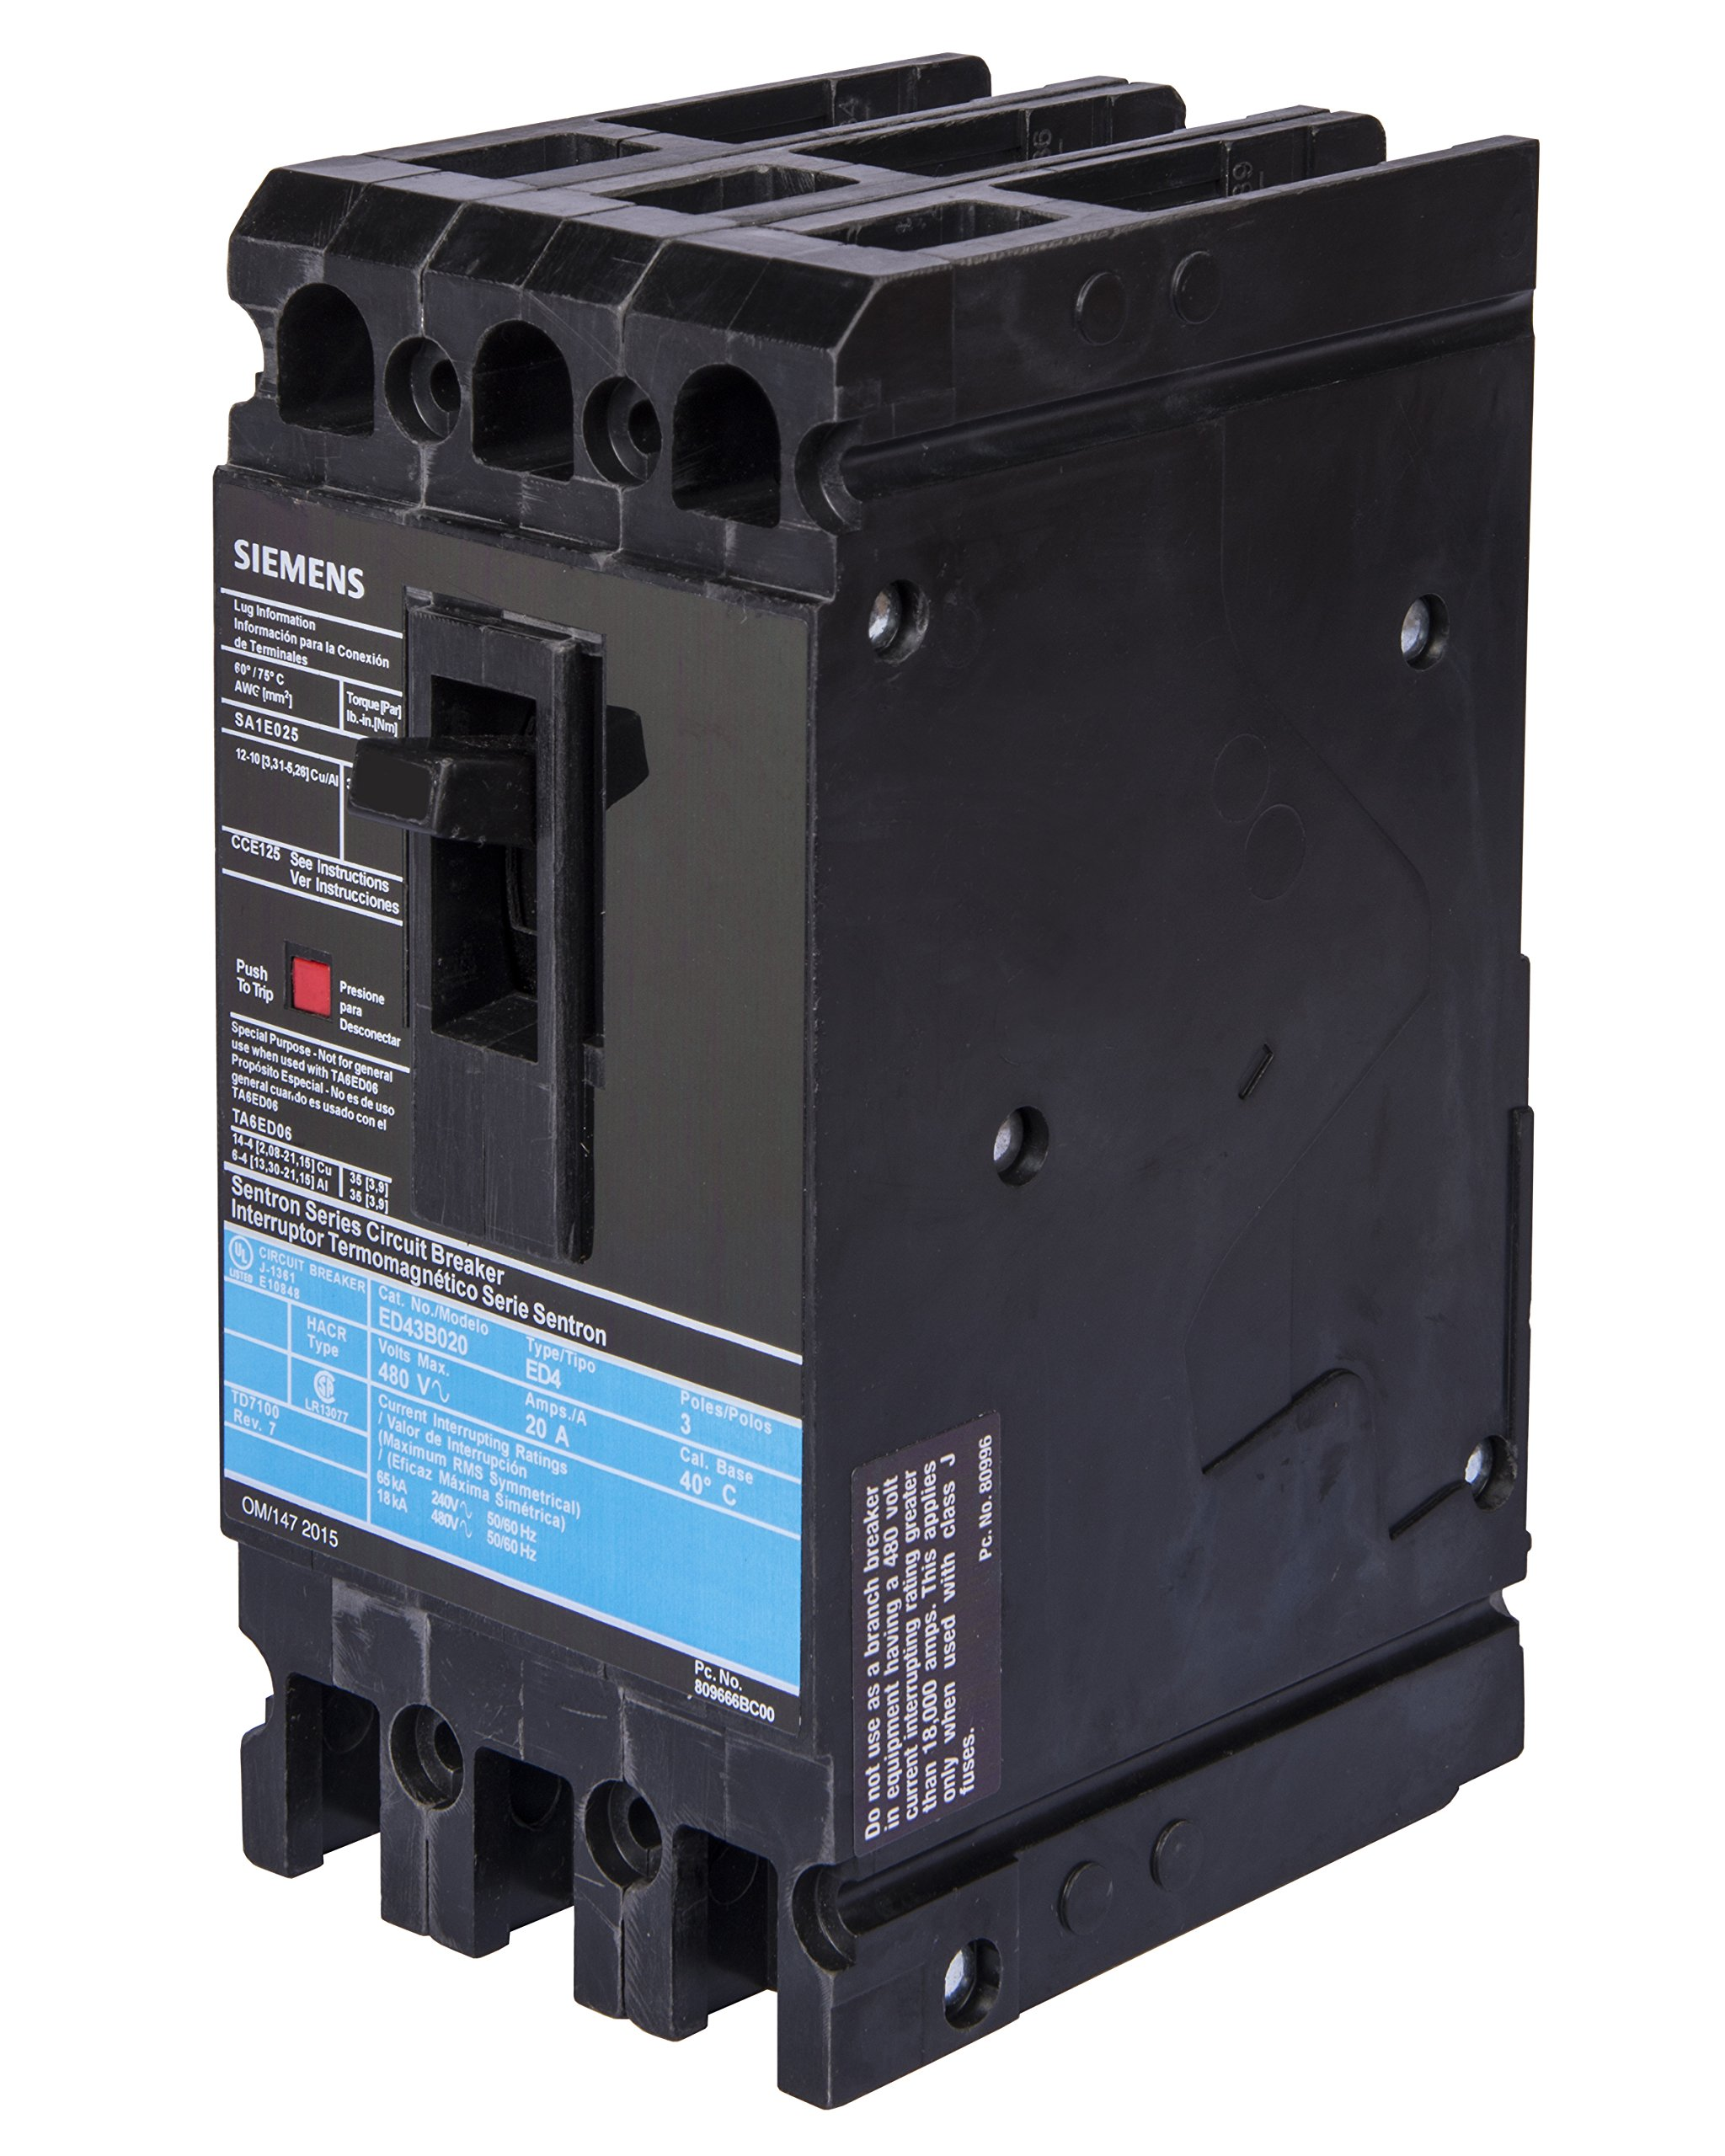 Siemens HED43B020 Circuit Breaker, Type HED4, 20 Amp, 3 Pole